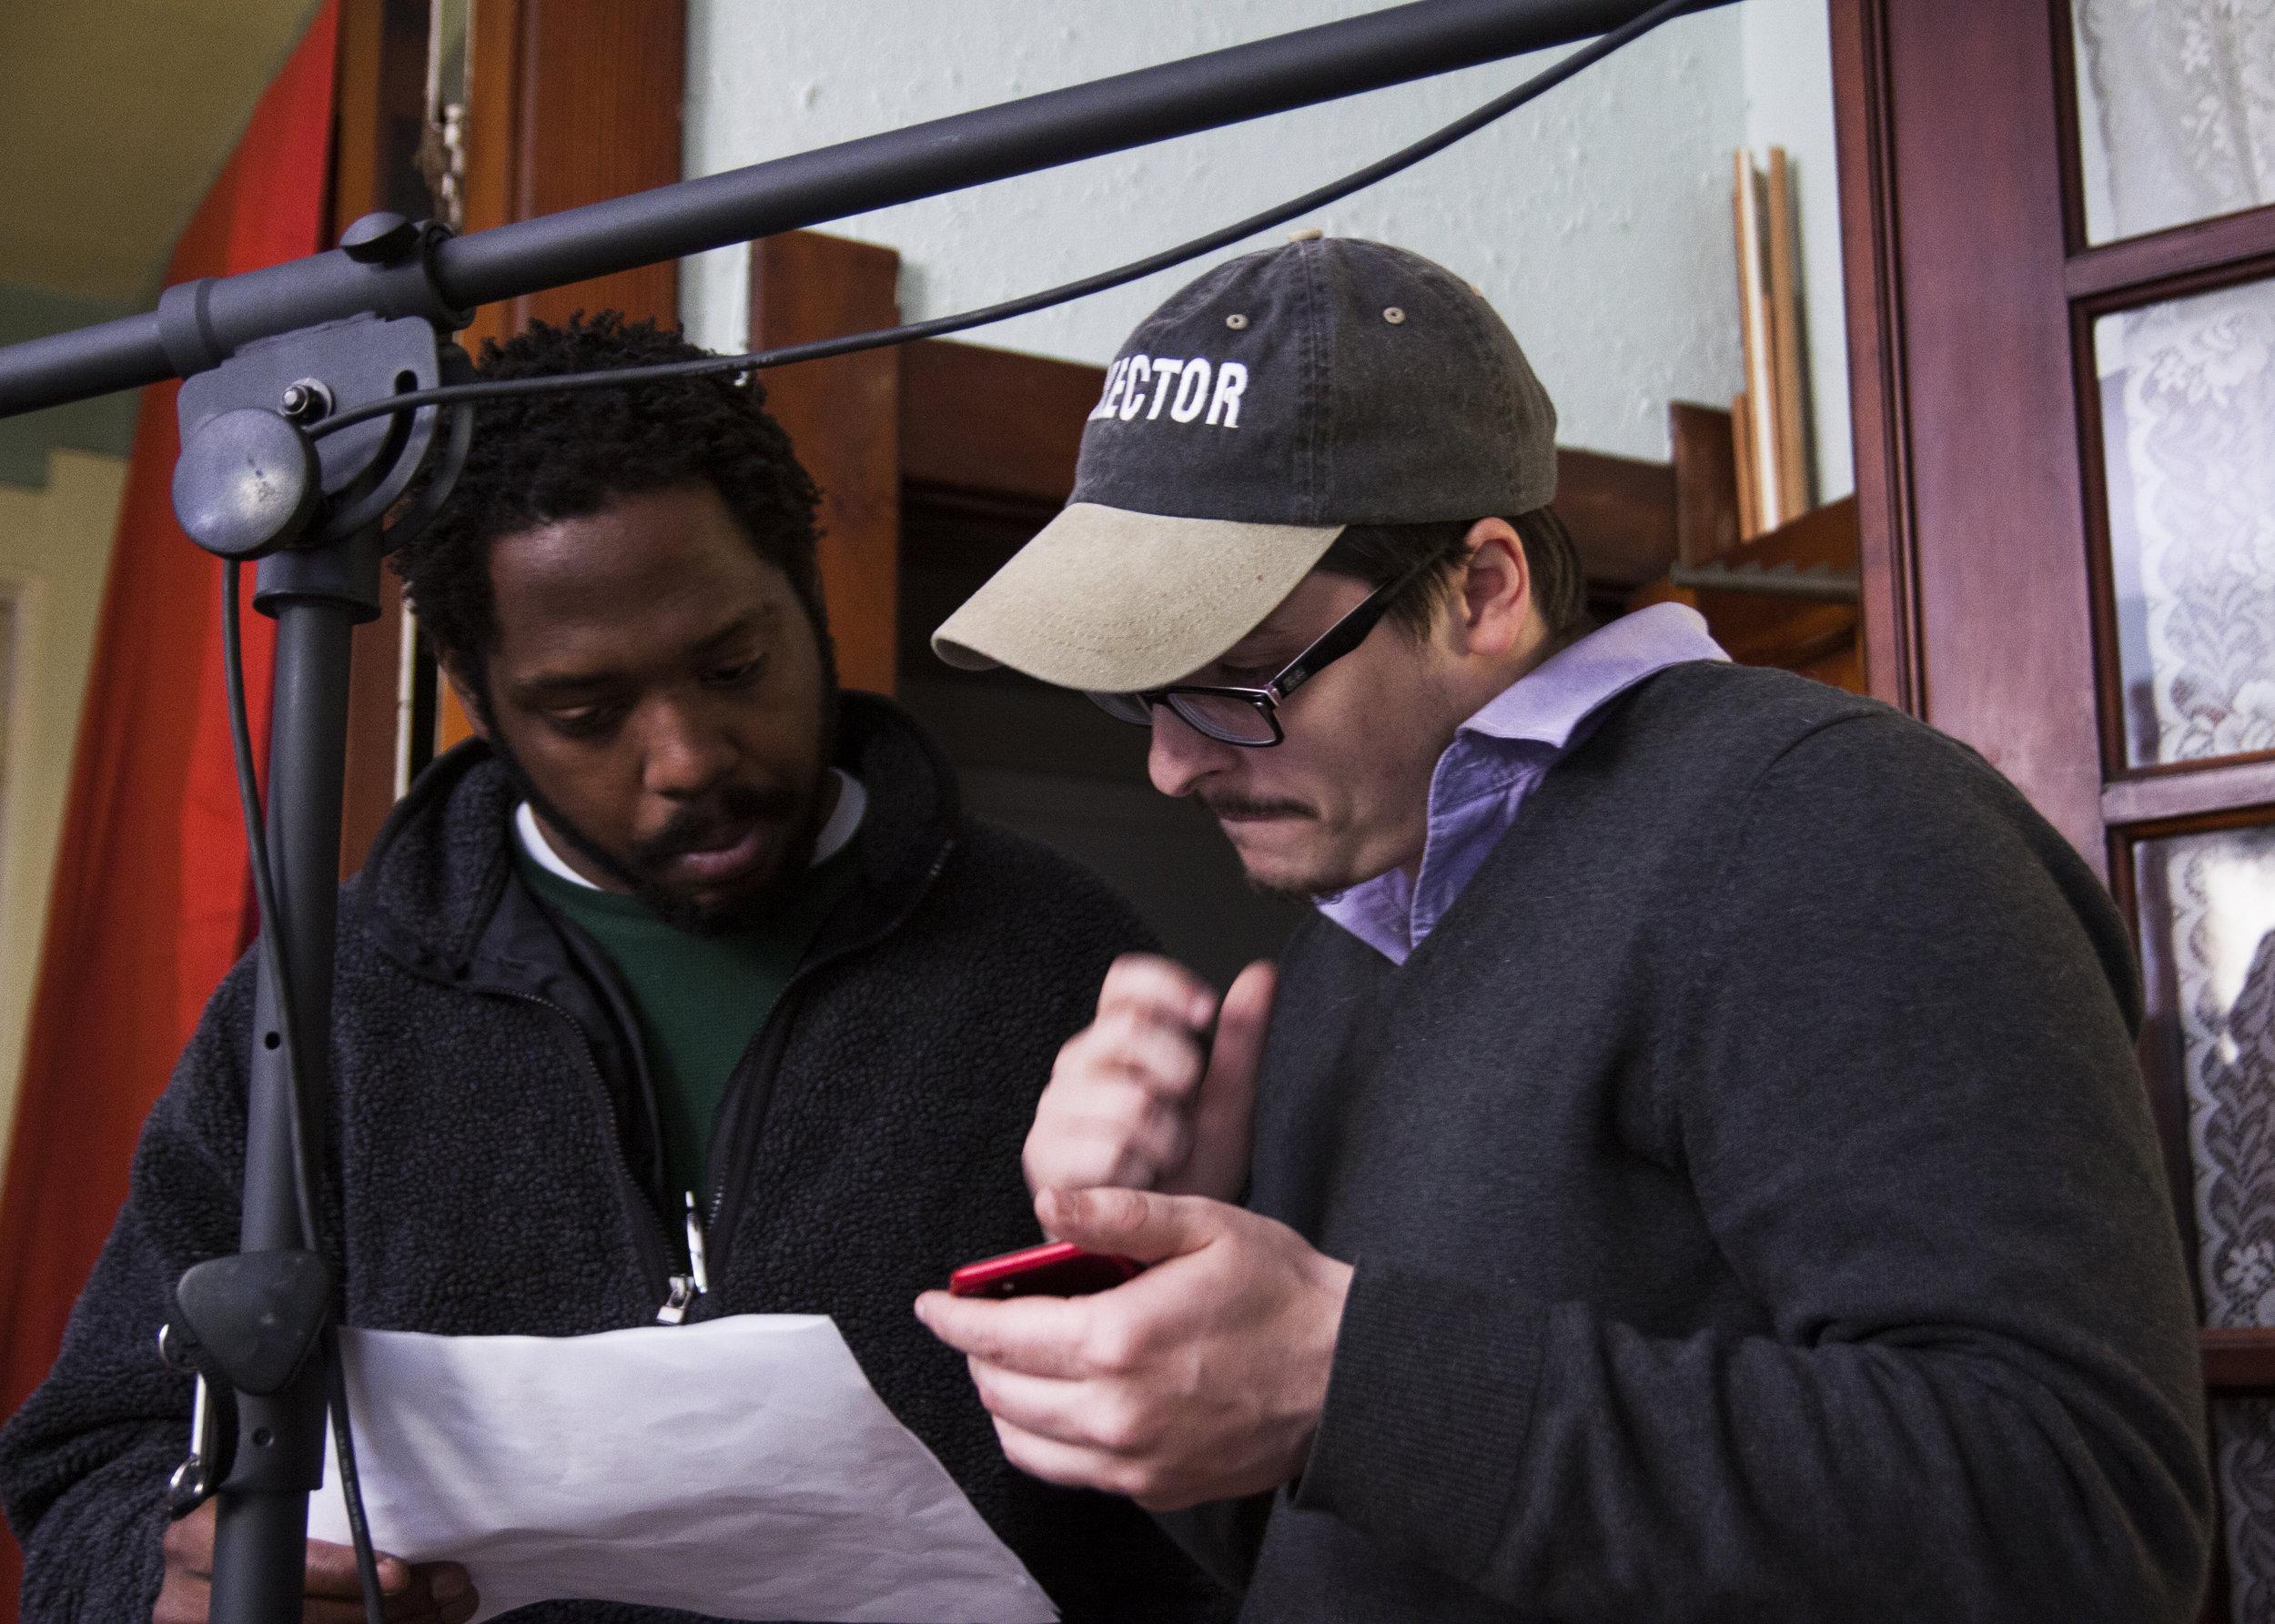 (Left to right) Toran Farrow, R.J. Maurer prep for a scene.